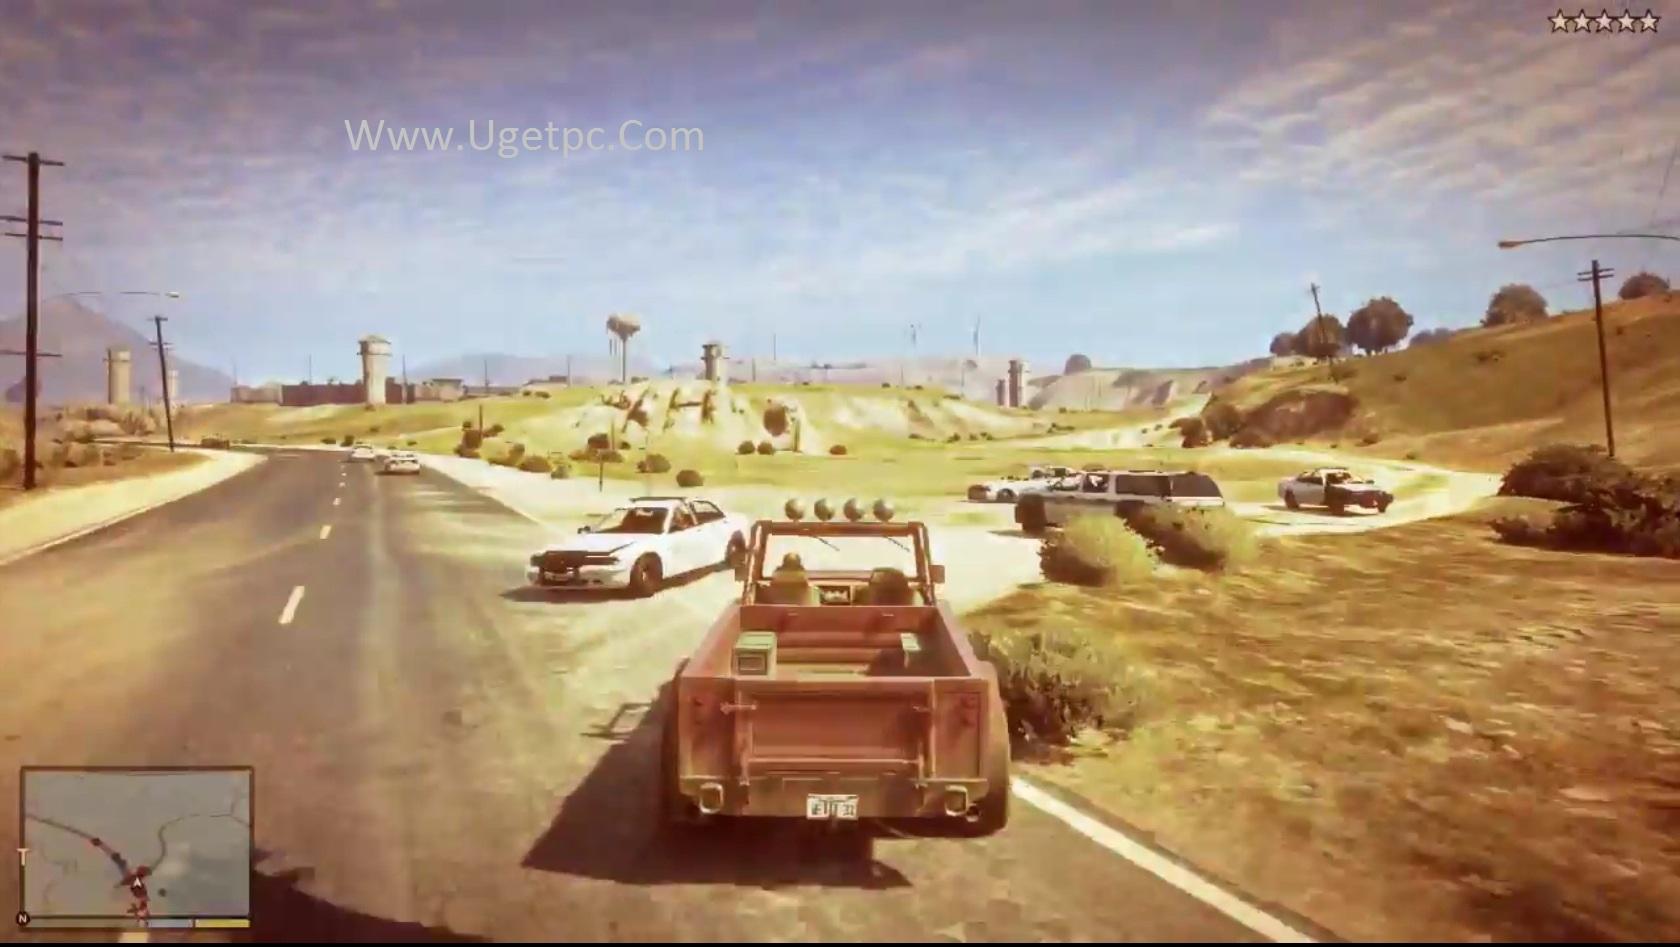 Grand-Theft-Auto-V-car-ugetpc